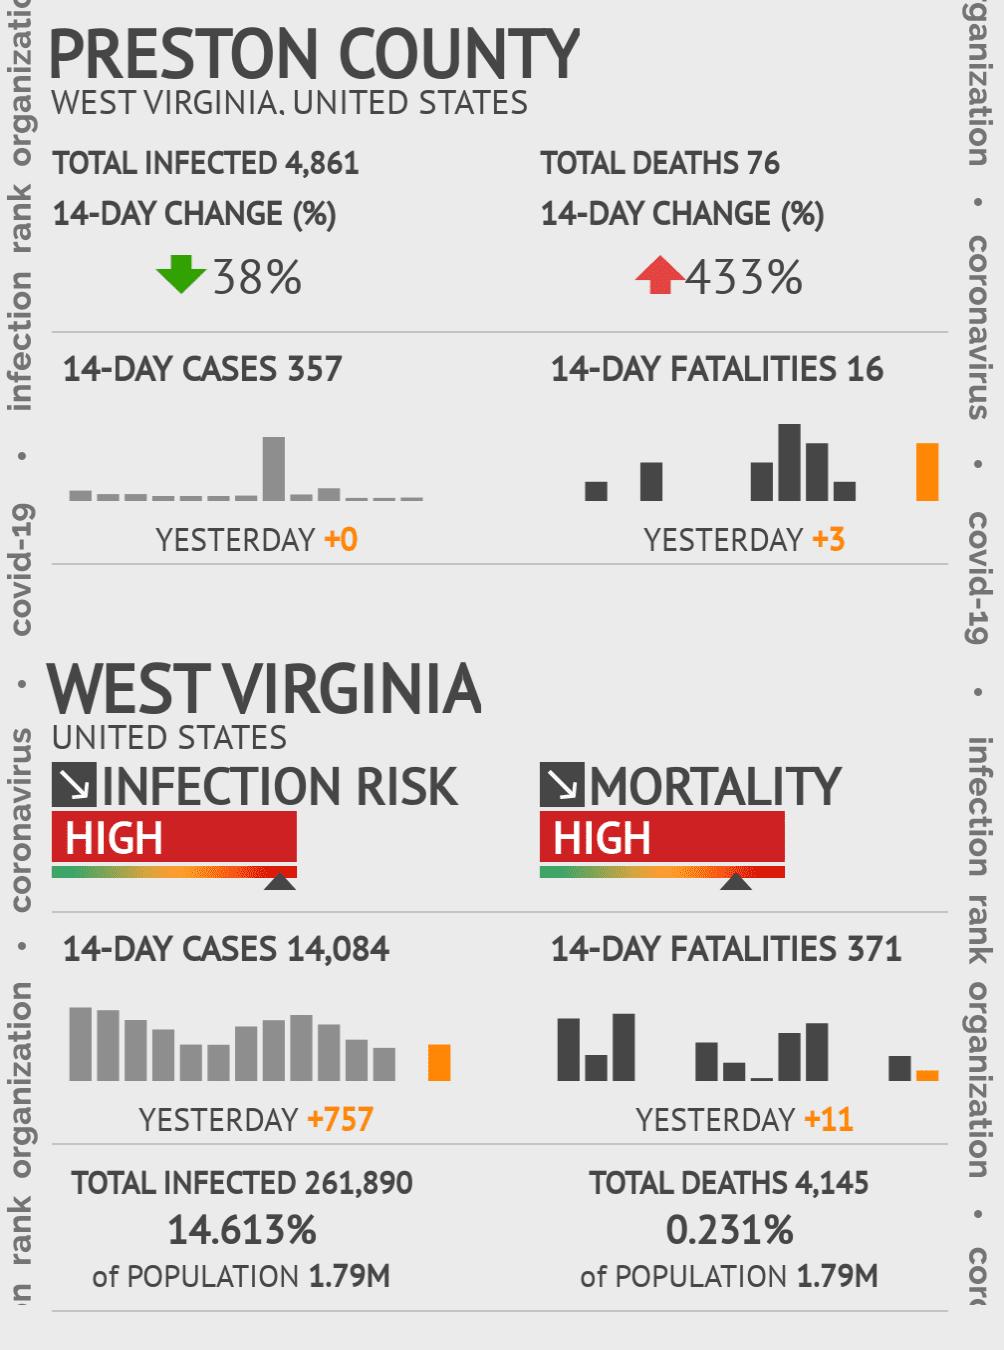 Preston County Coronavirus Covid-19 Risk of Infection on February 24, 2021